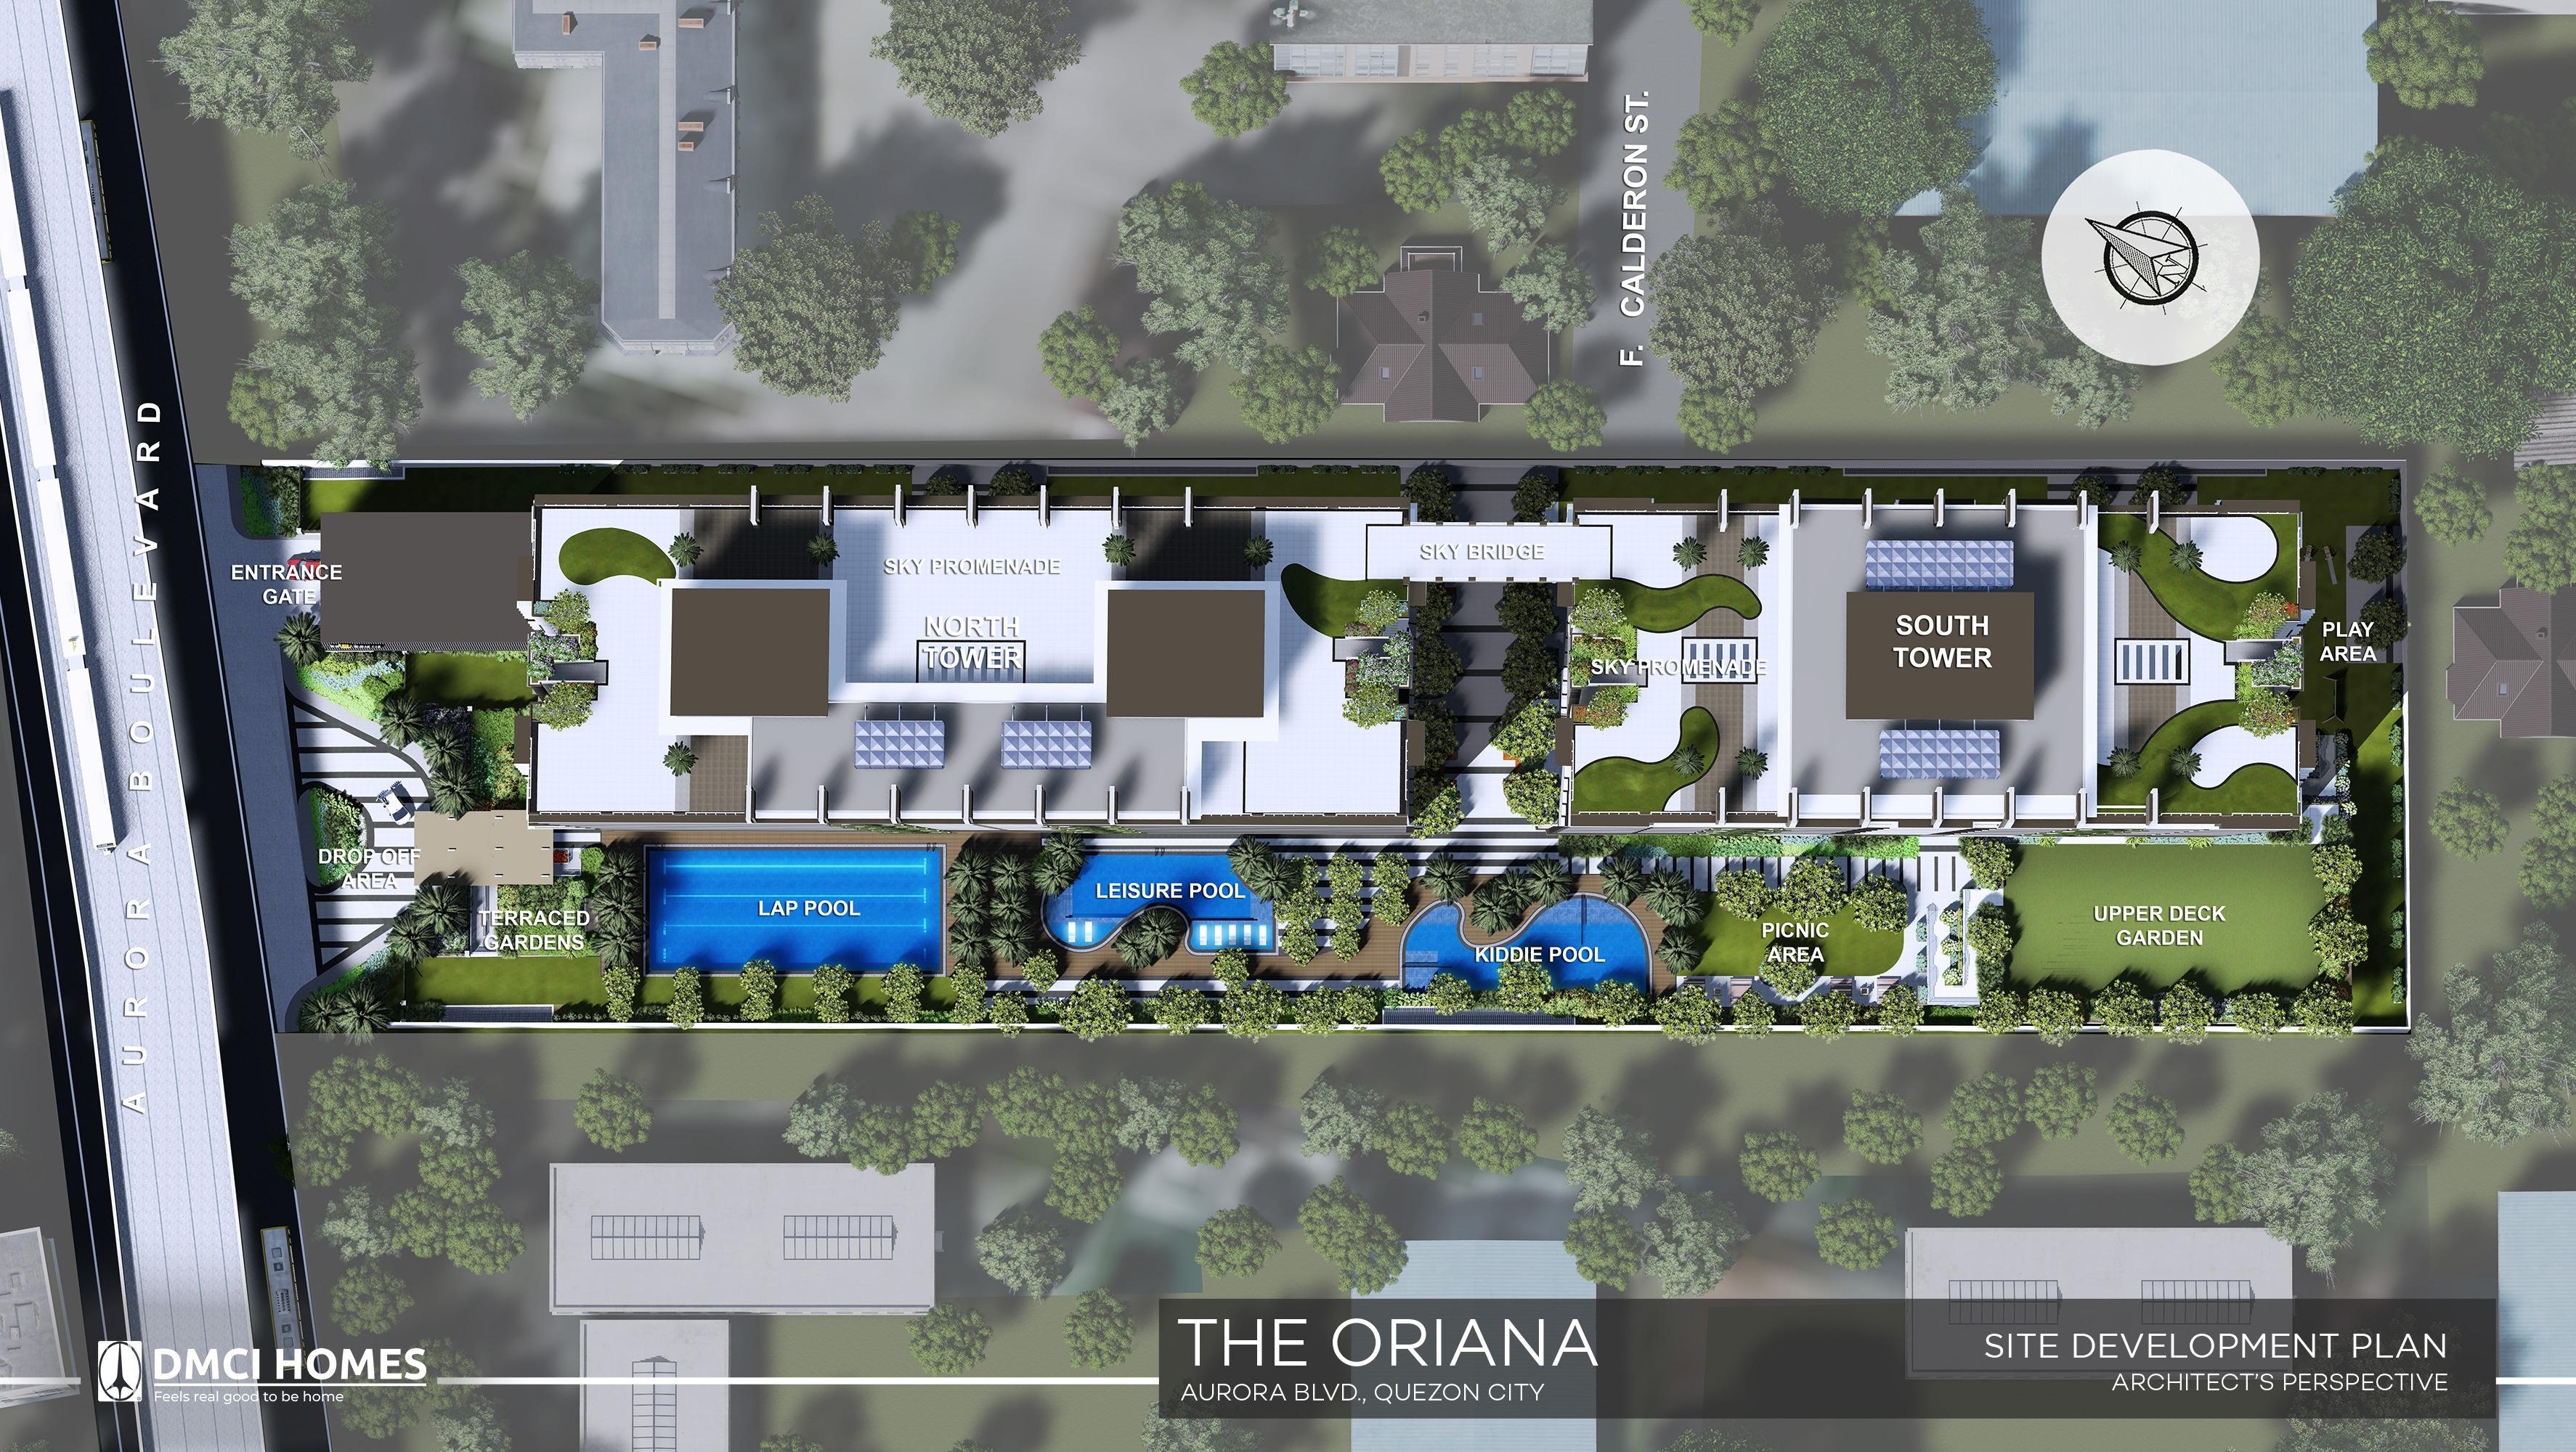 The Oriana, Aurora Boulevard, Quezon City